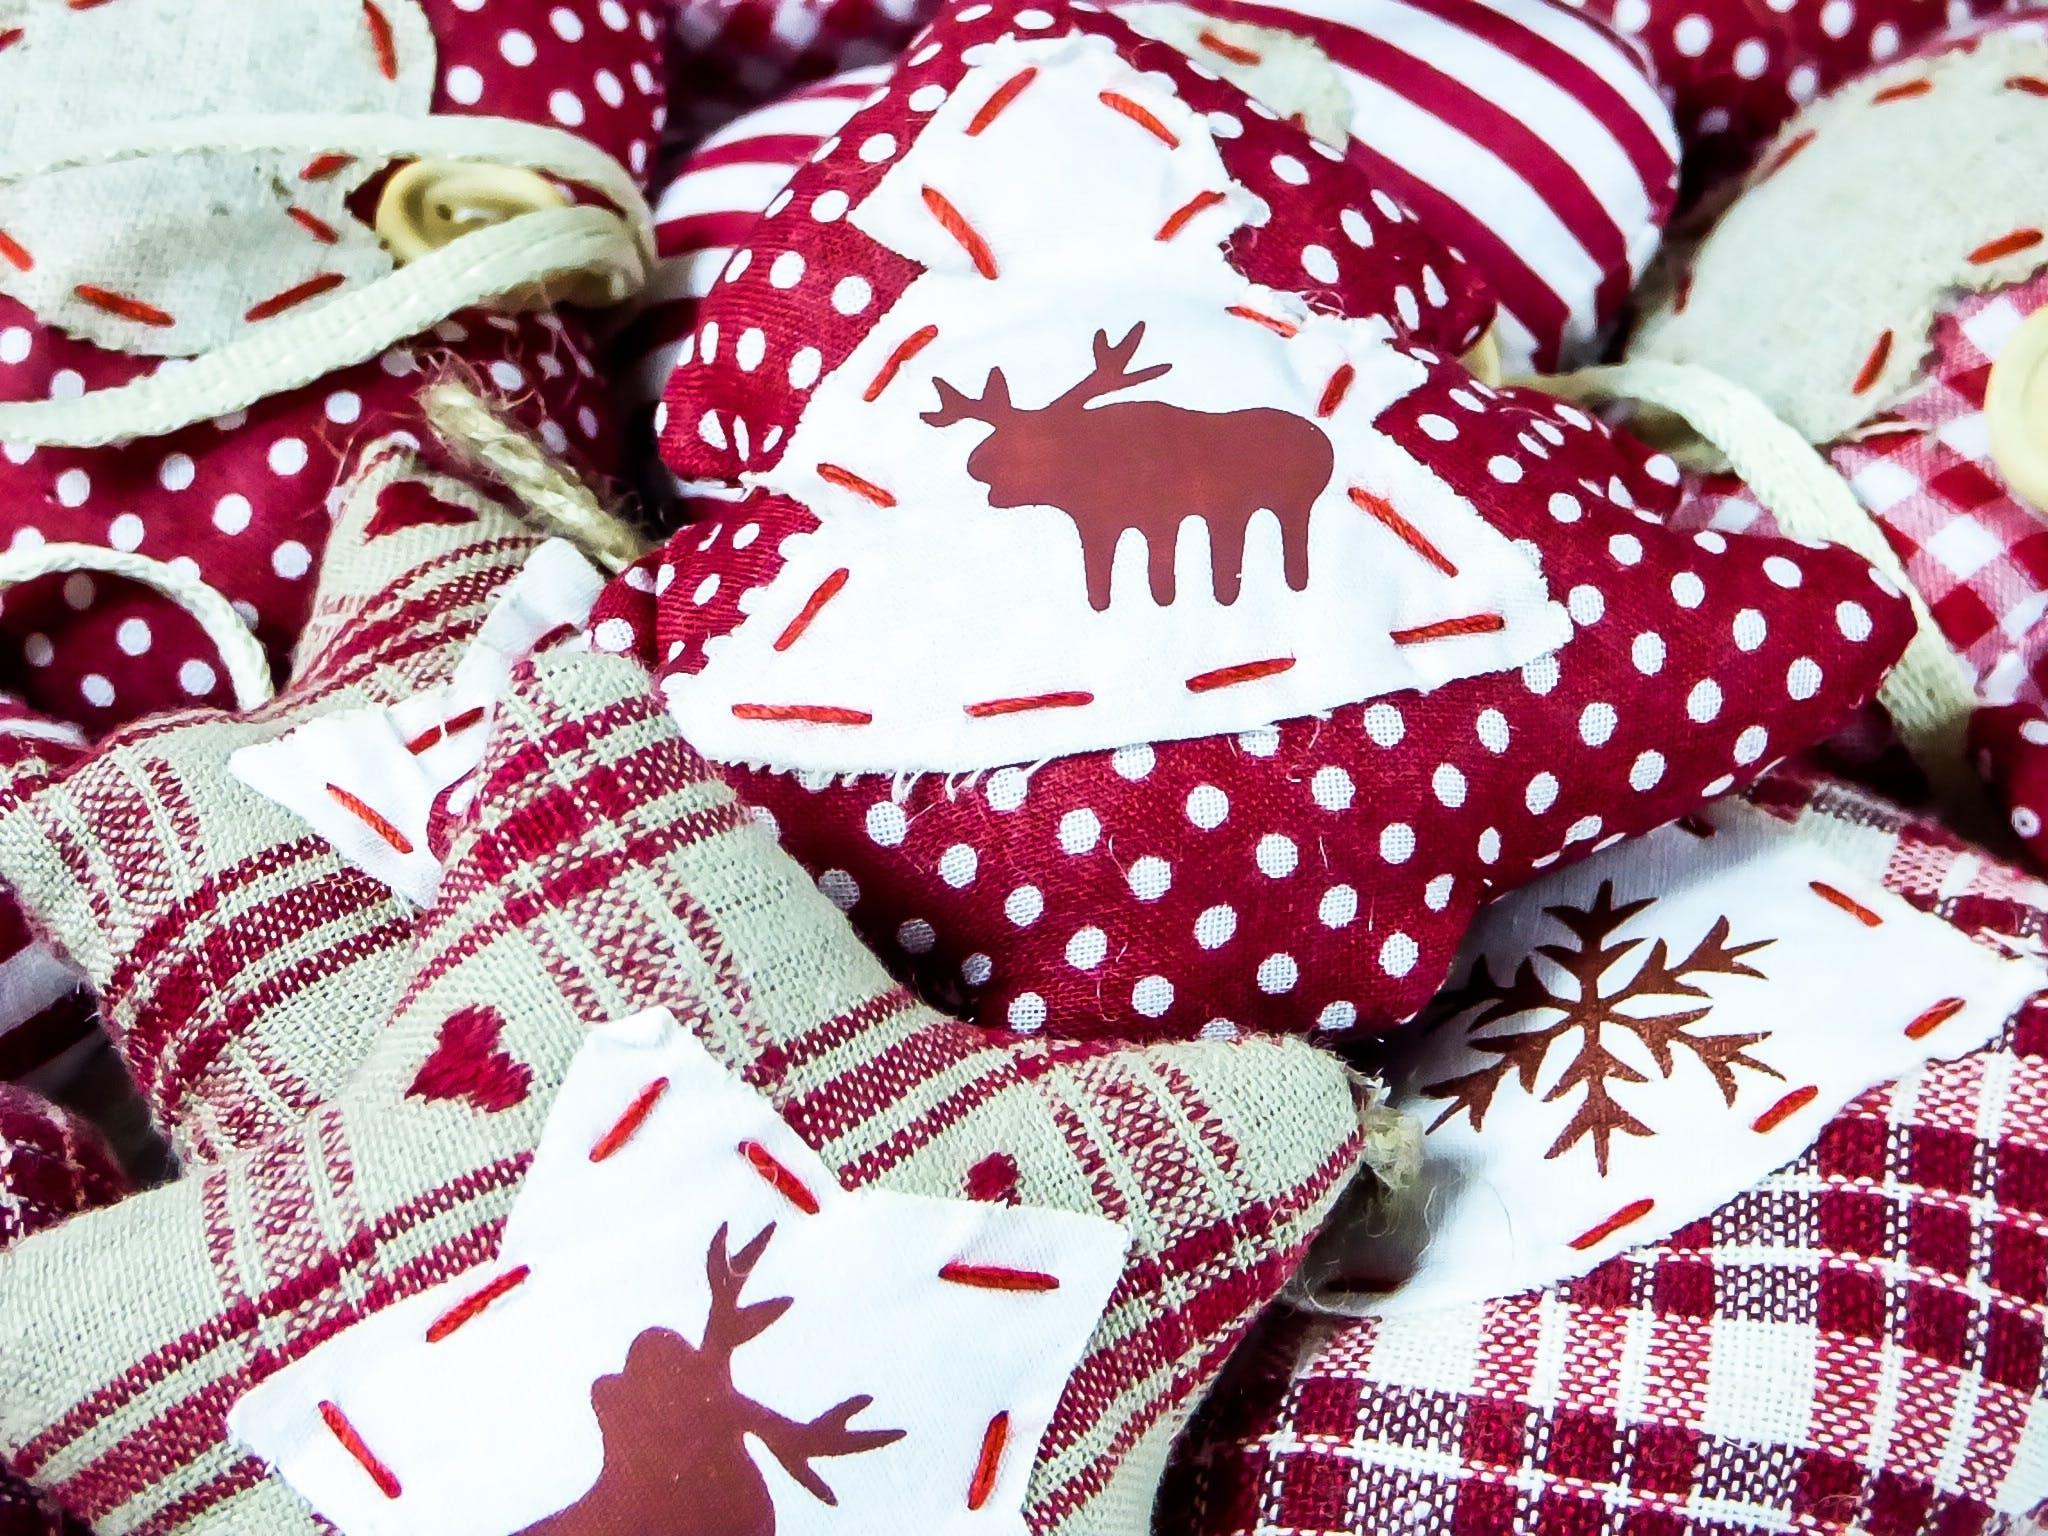 High Angle View of Christmas Decorations